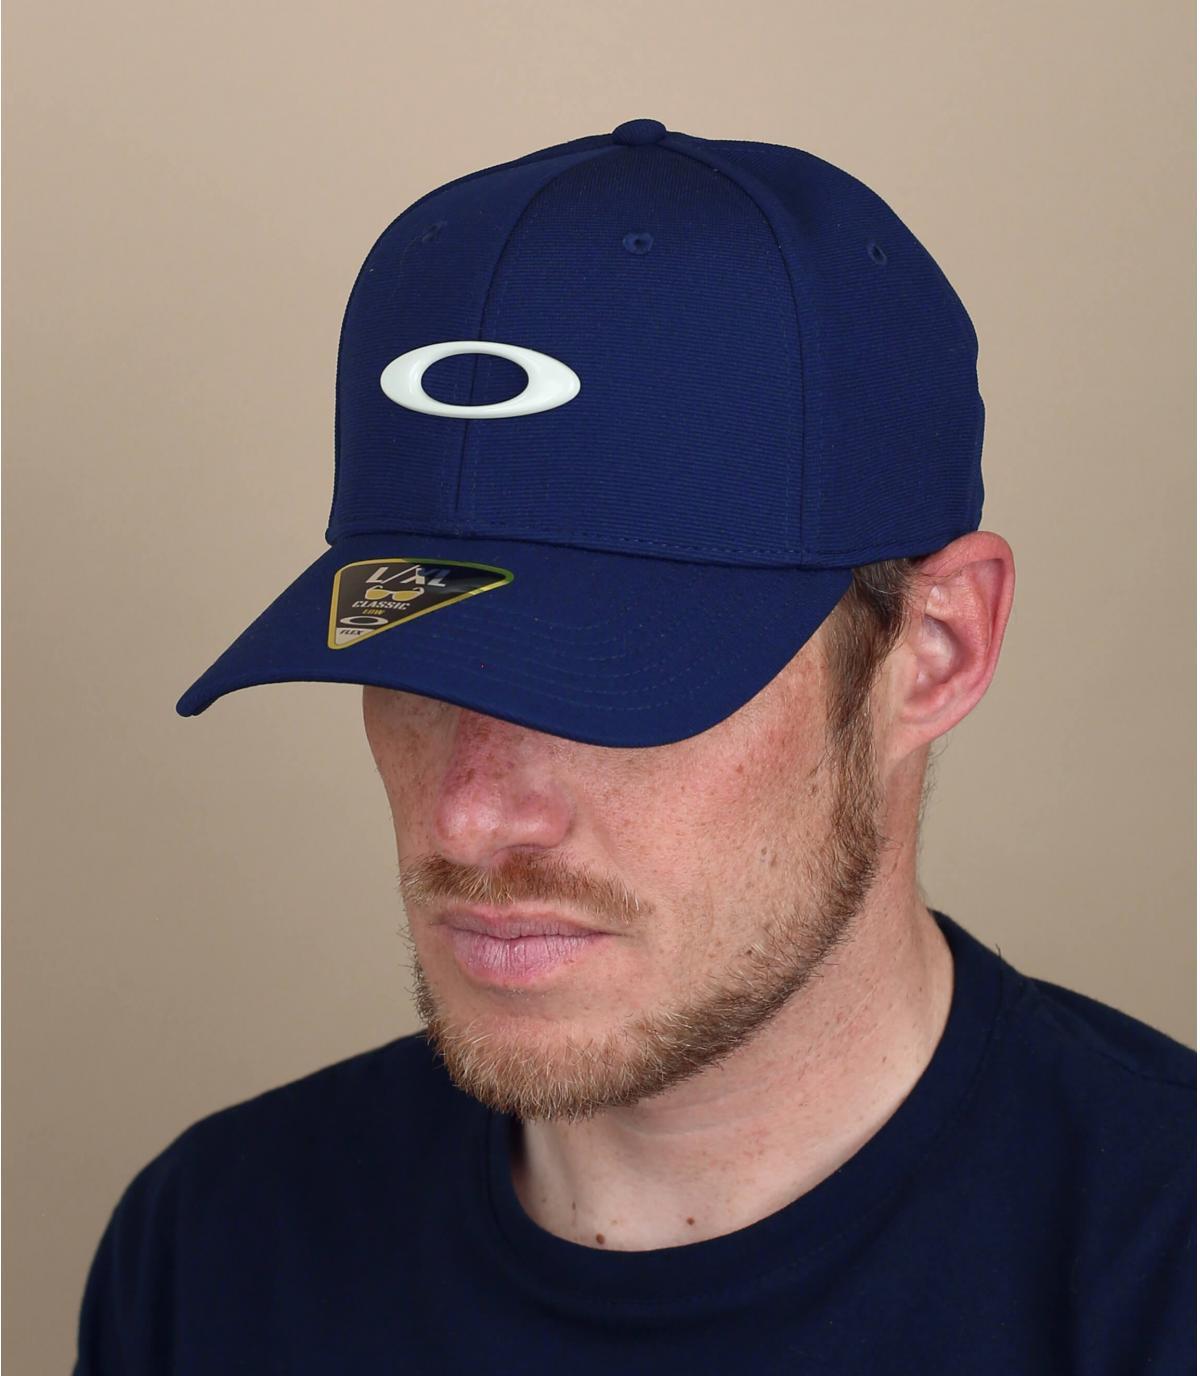 navy blue Oakley cap